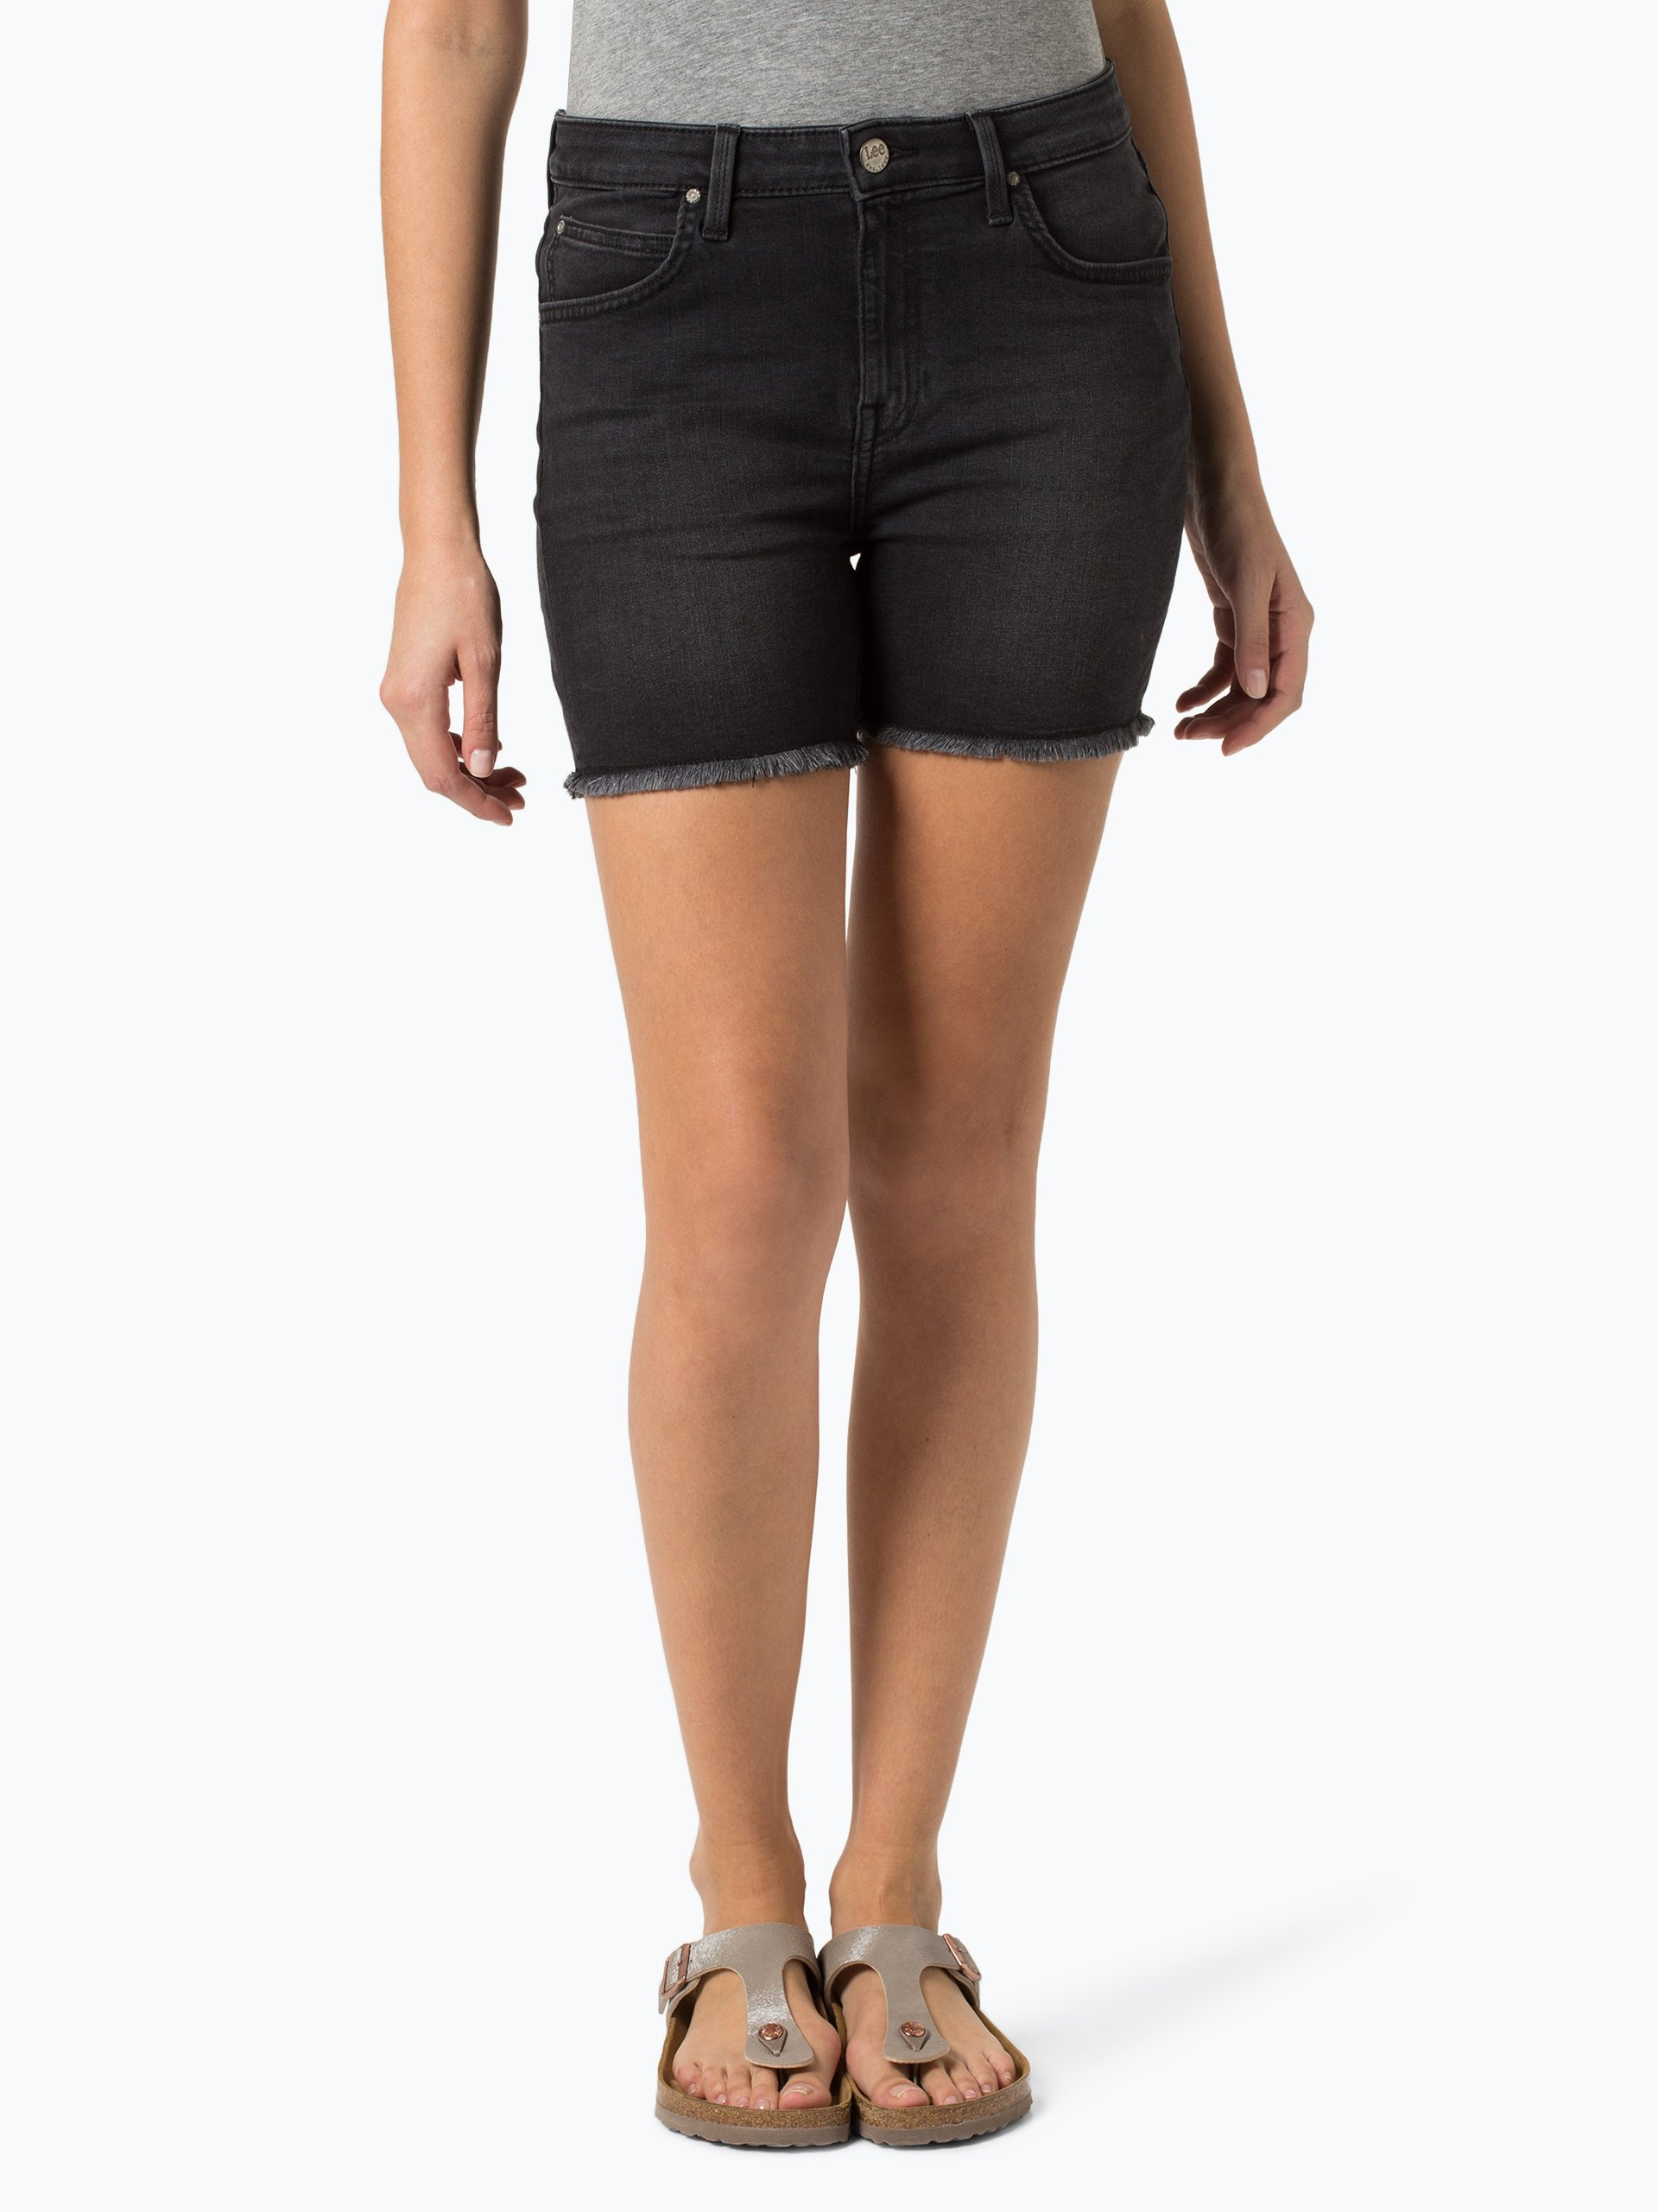 lee damen jeansshorts boyfriend short schwarz uni online. Black Bedroom Furniture Sets. Home Design Ideas